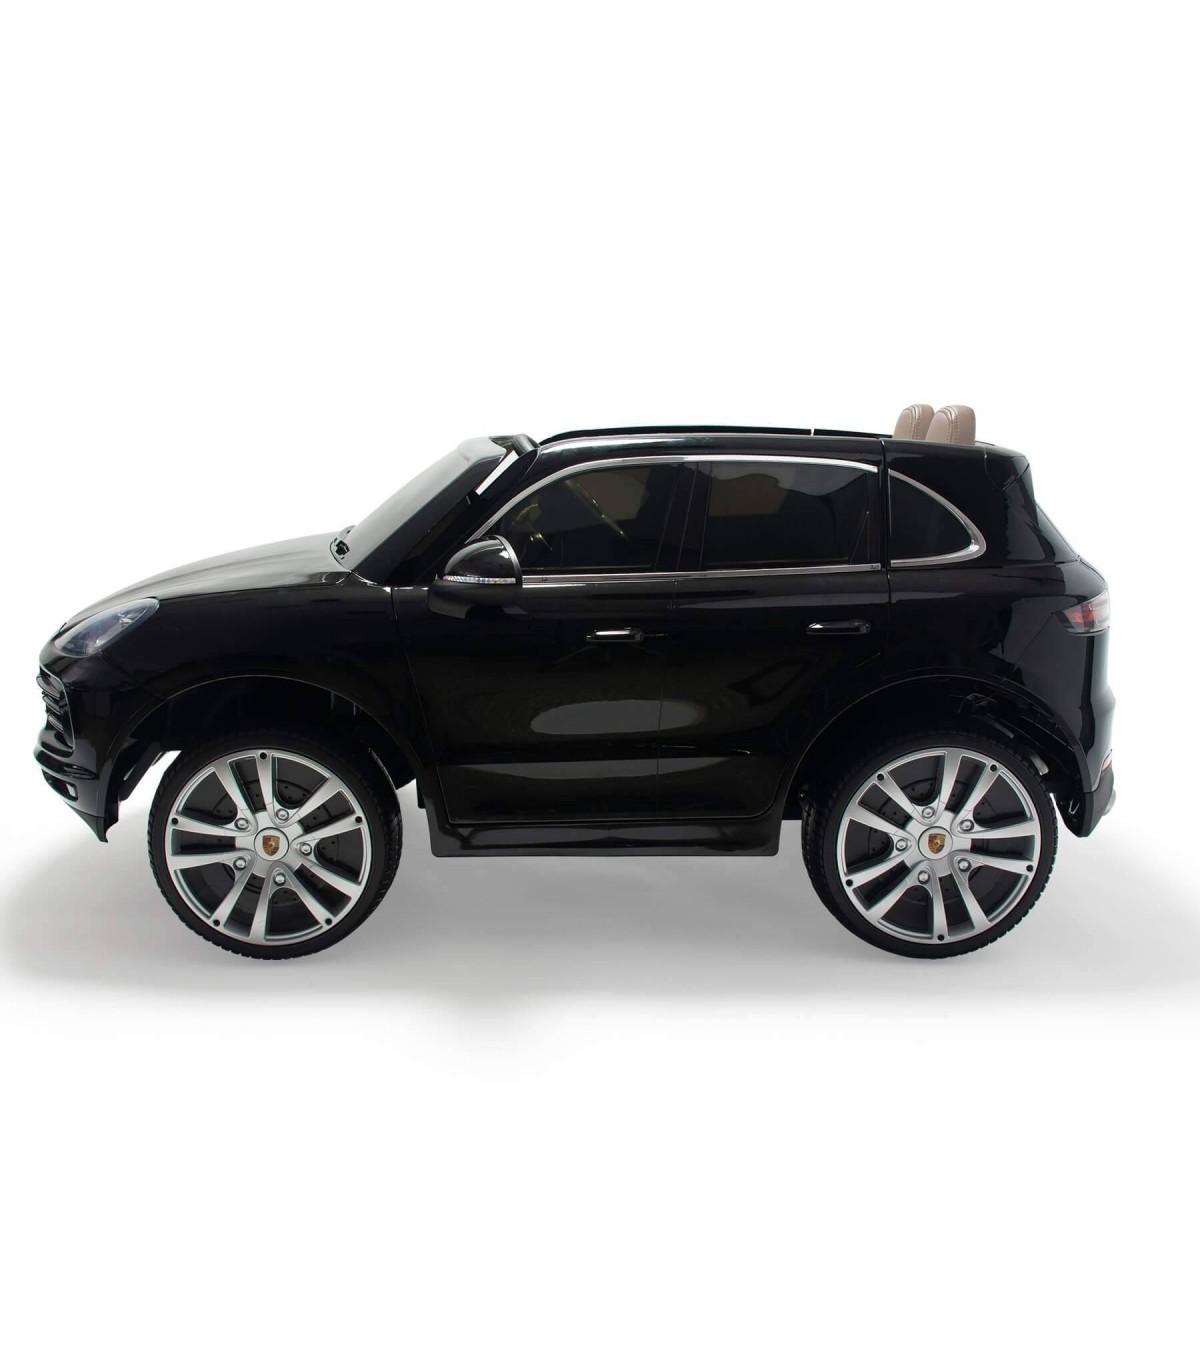 Porsche Cayenne 12 V Noir